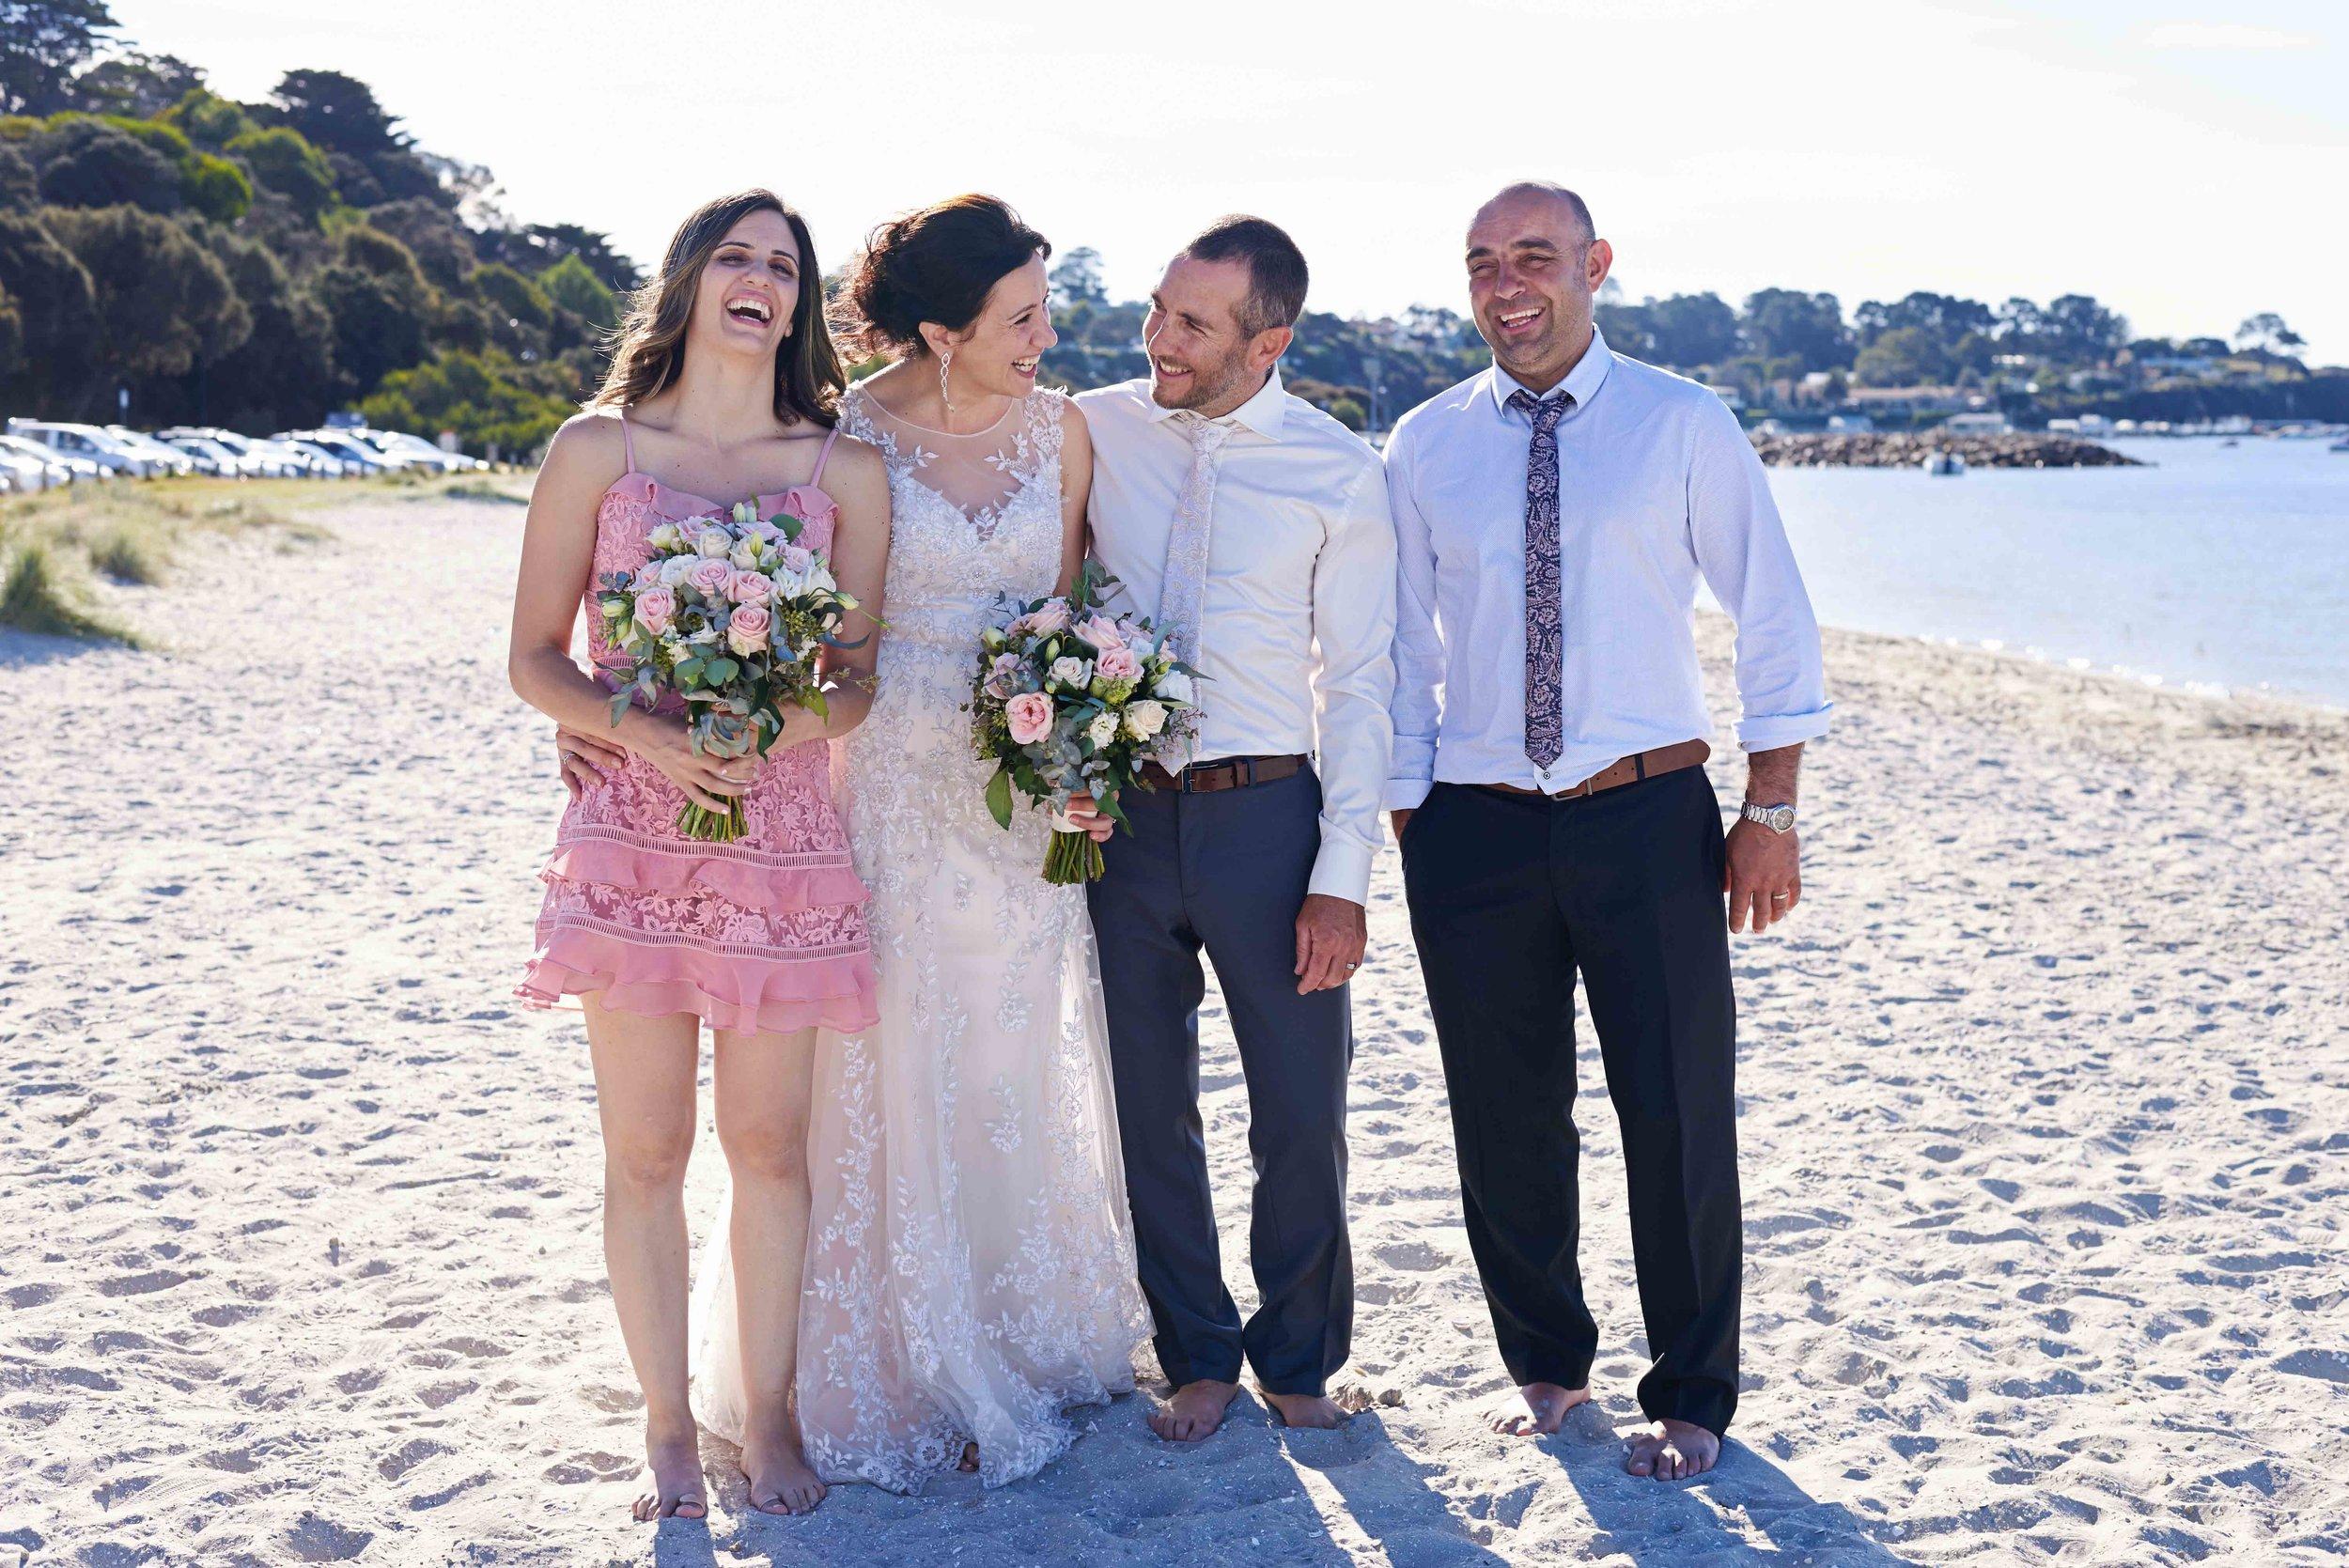 sorrento-wedding-photography-all-smiles-marissa-jade-photography-166.jpg